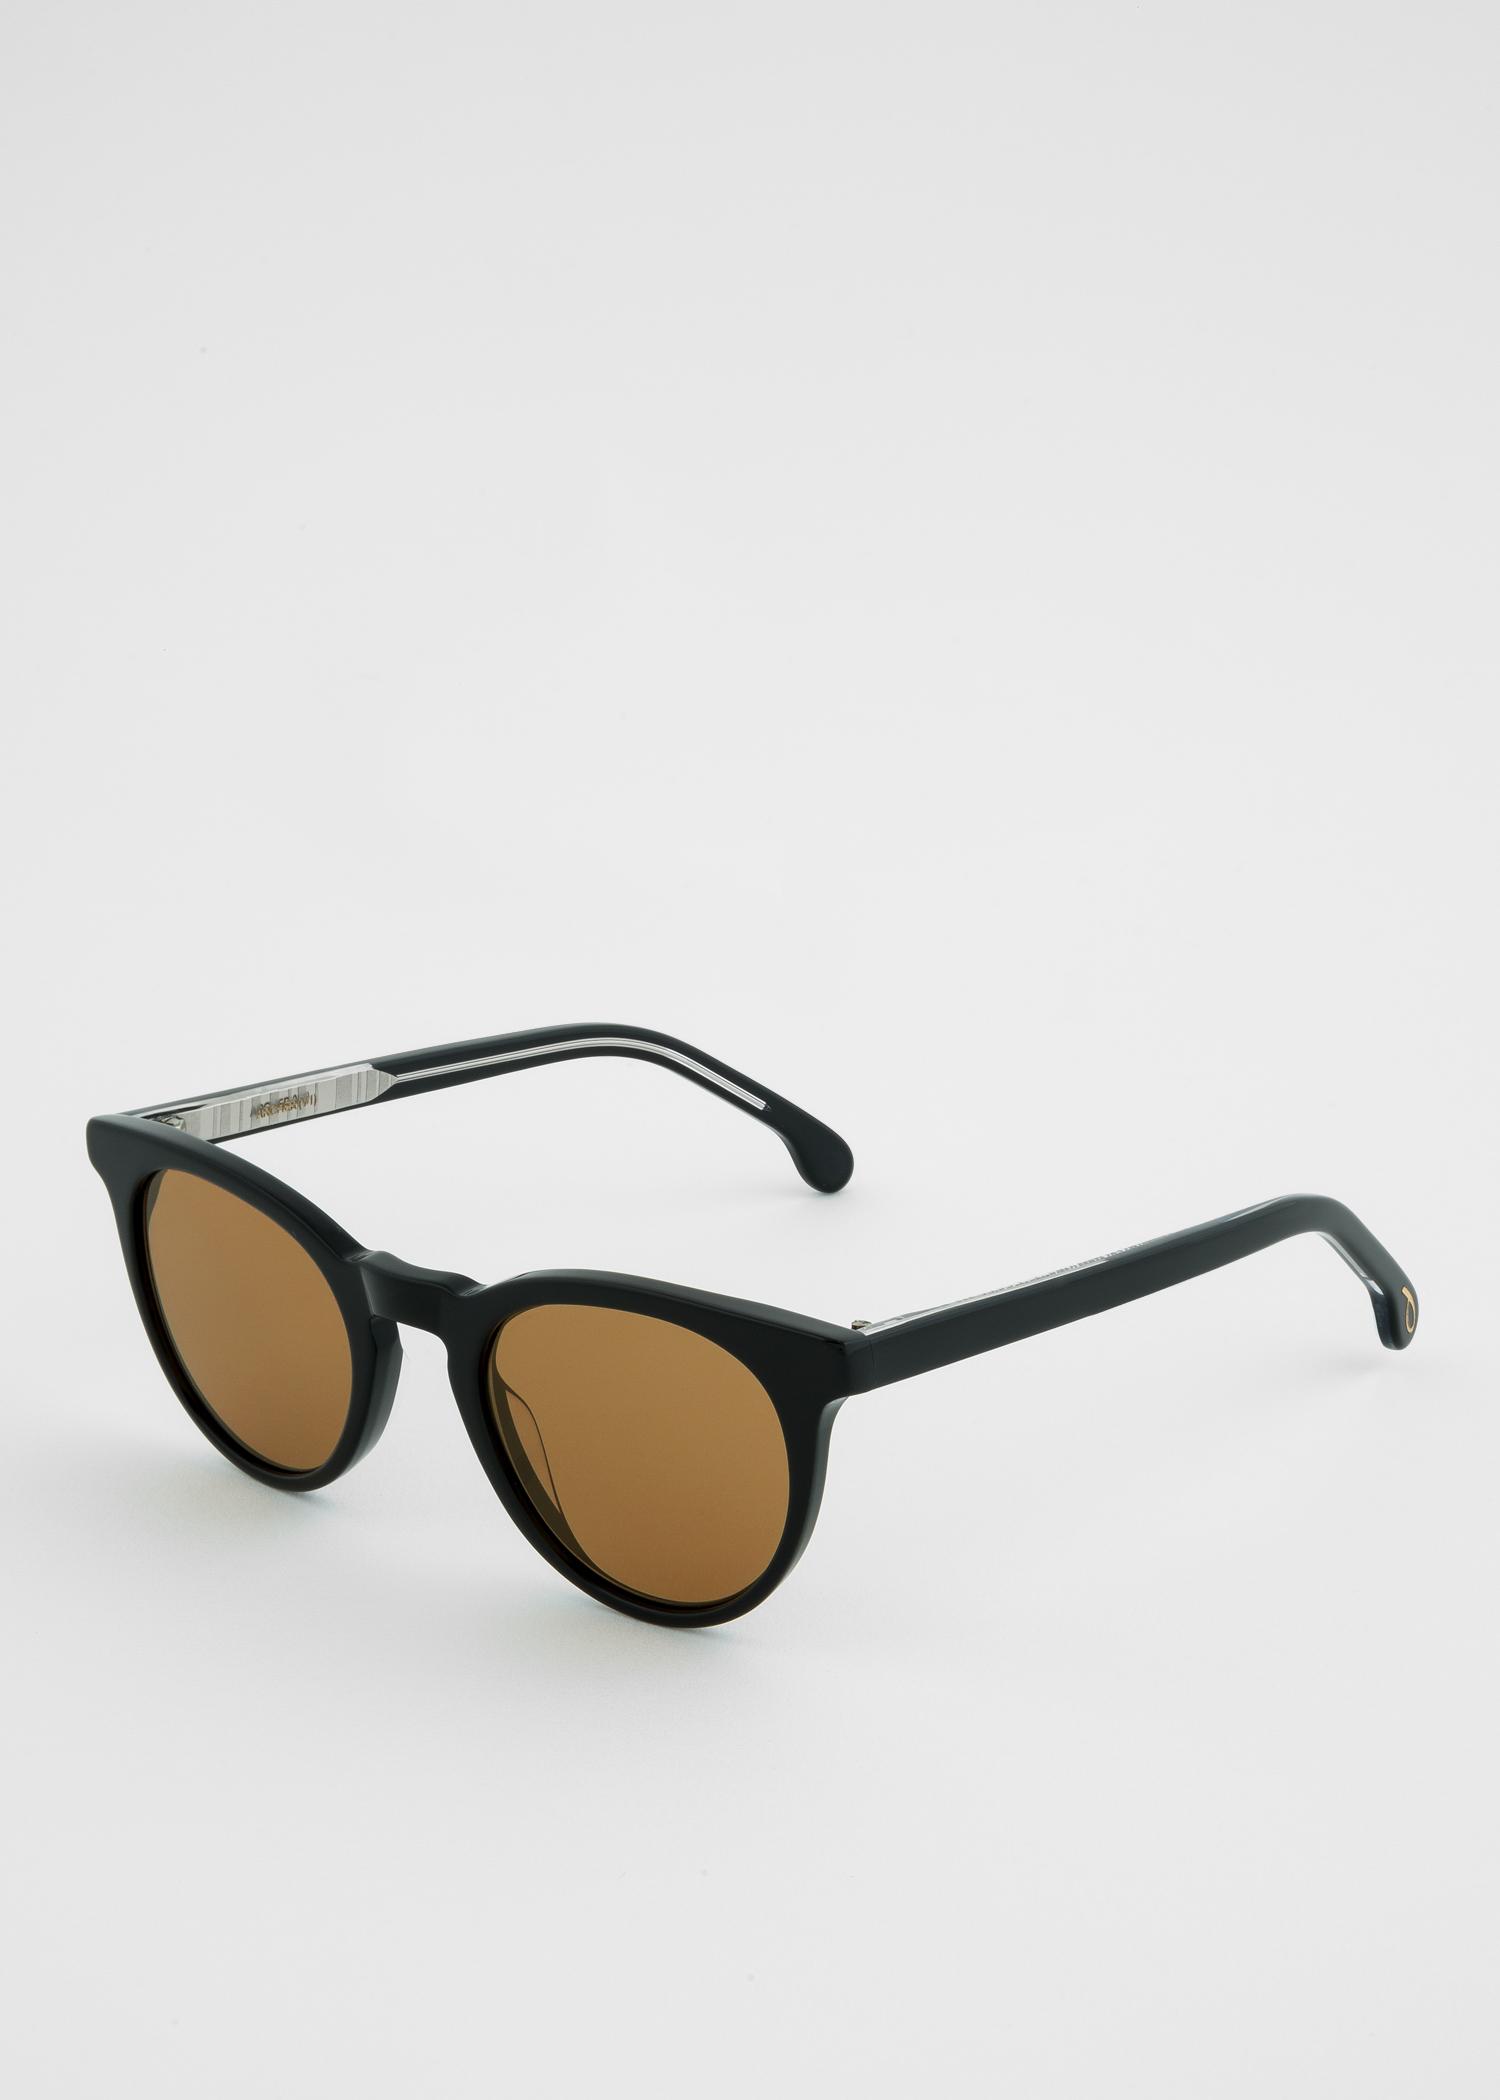 98b4b1e5f01ca Paul Smith Black Ink  Archer  Sunglasses - Paul Smith Asia